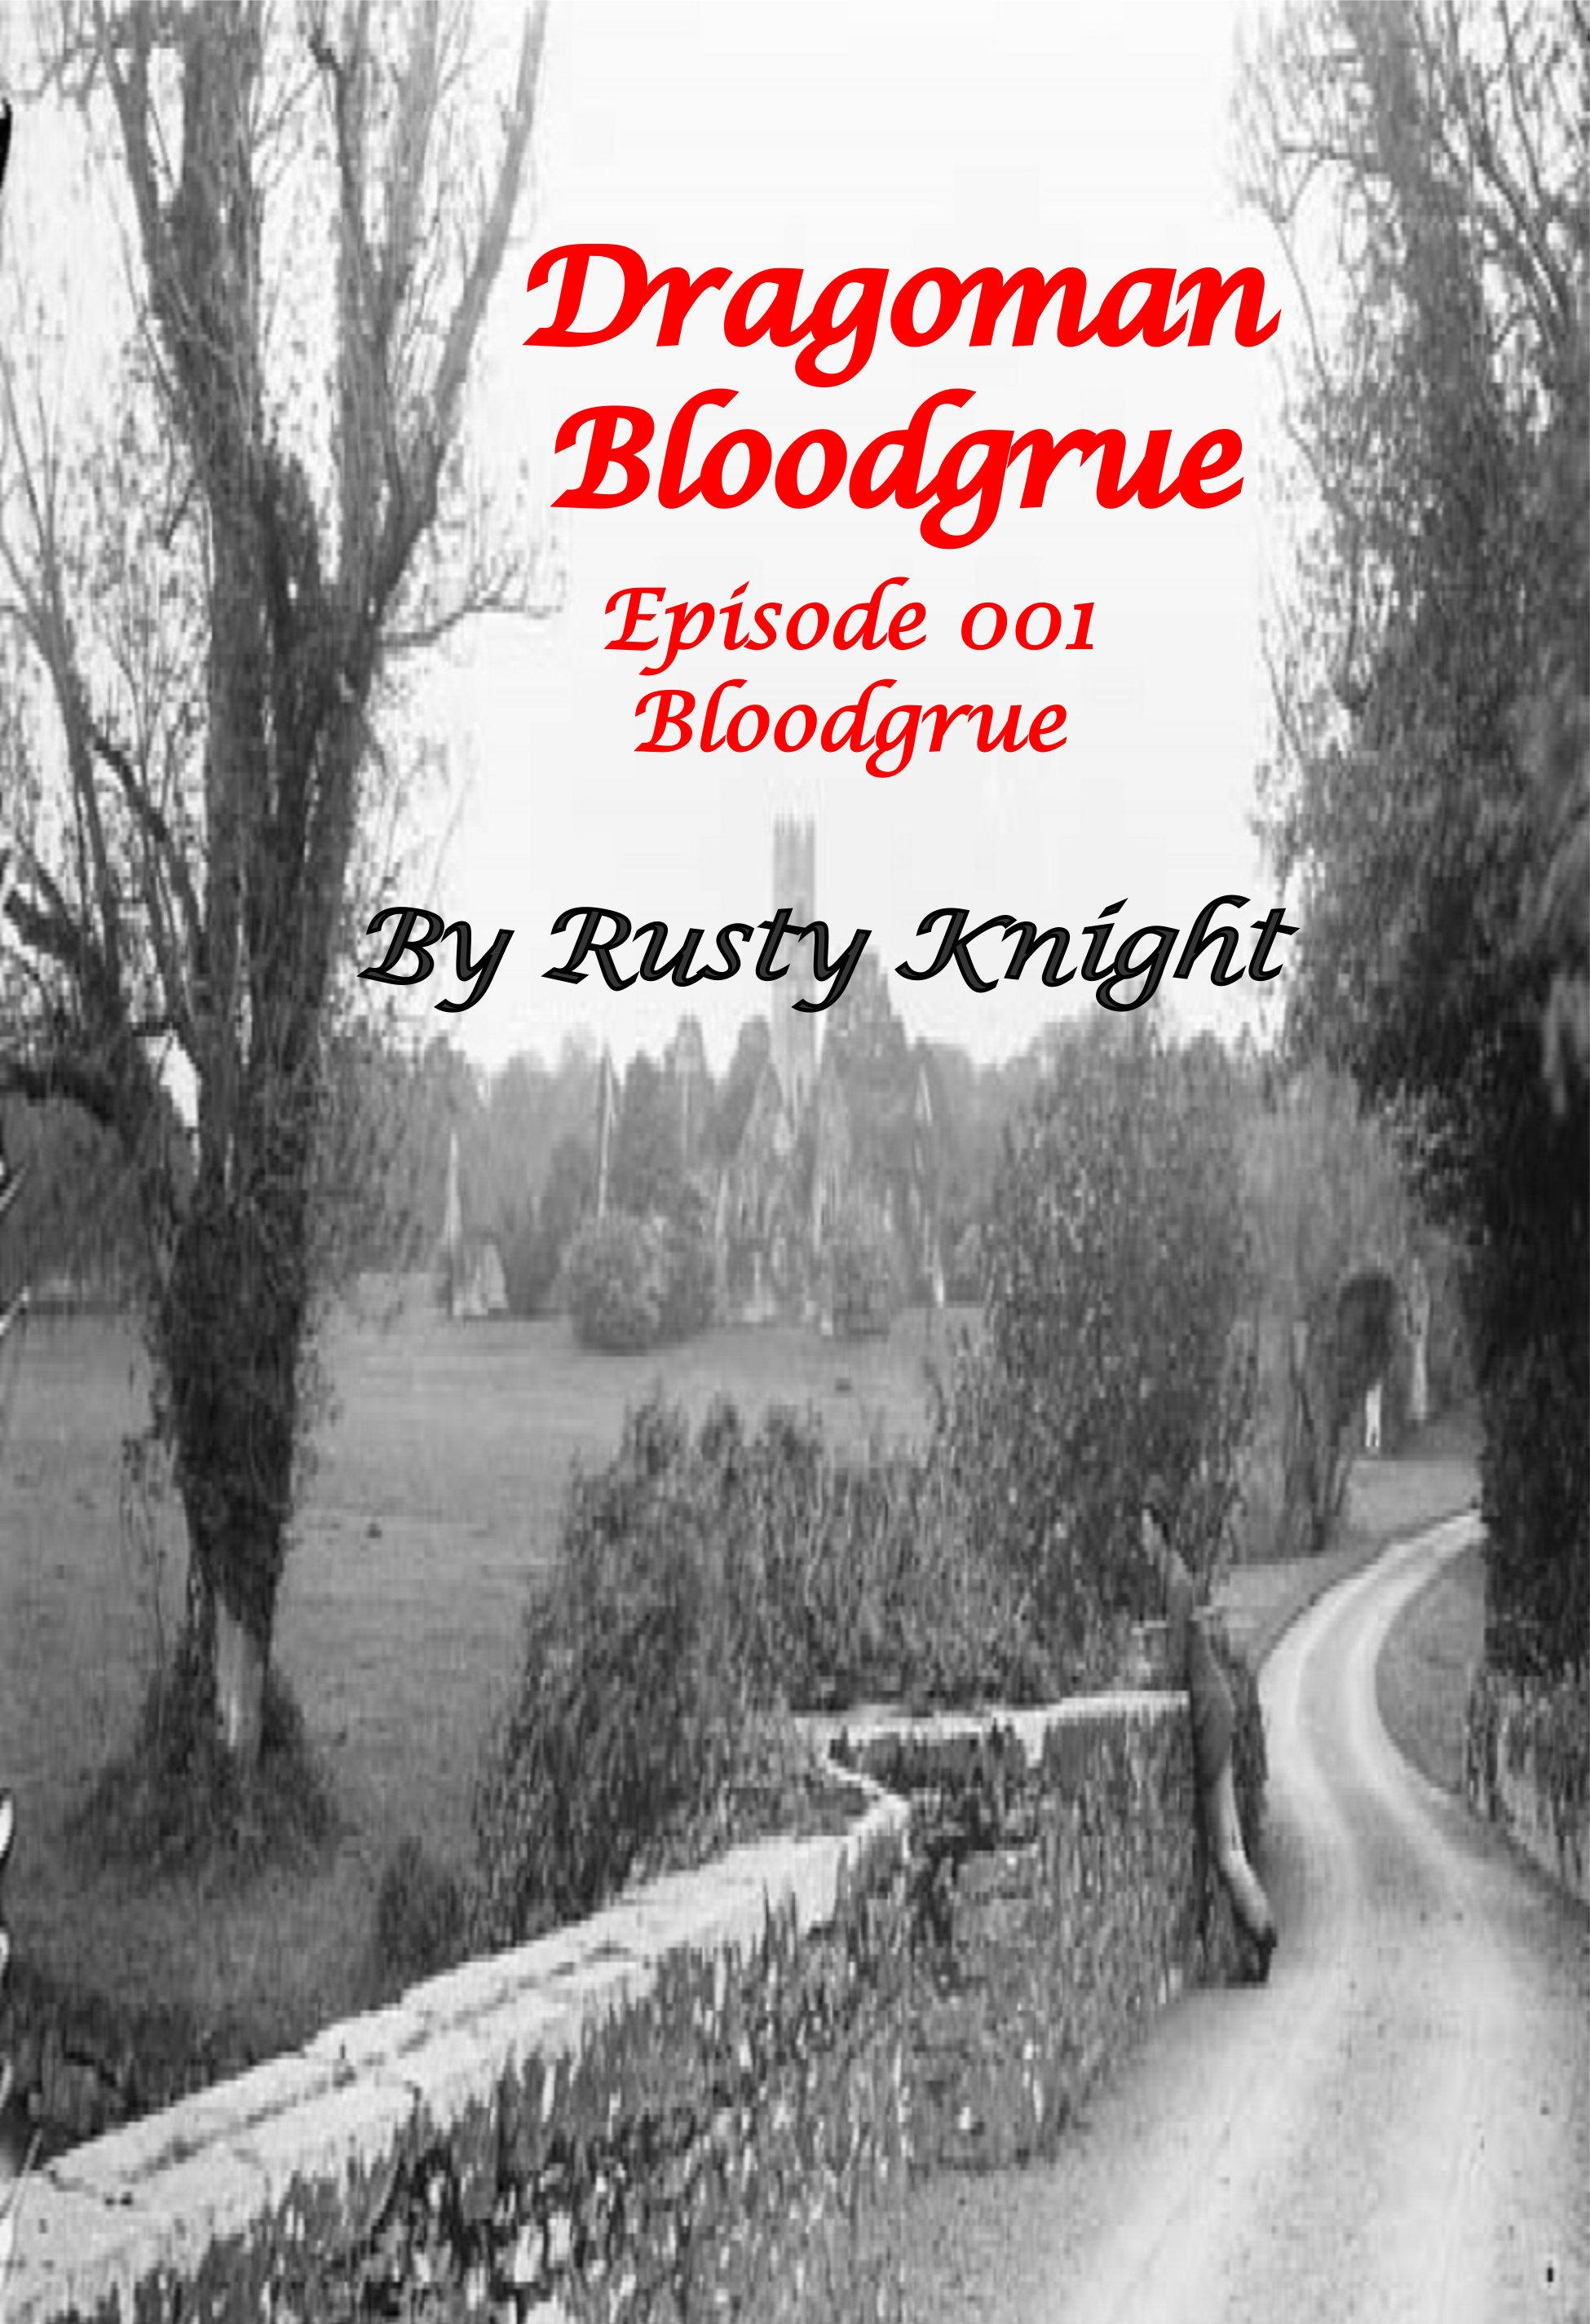 Free episode of Dragoman Bloodgrue E001, e-copy DB15DC001F